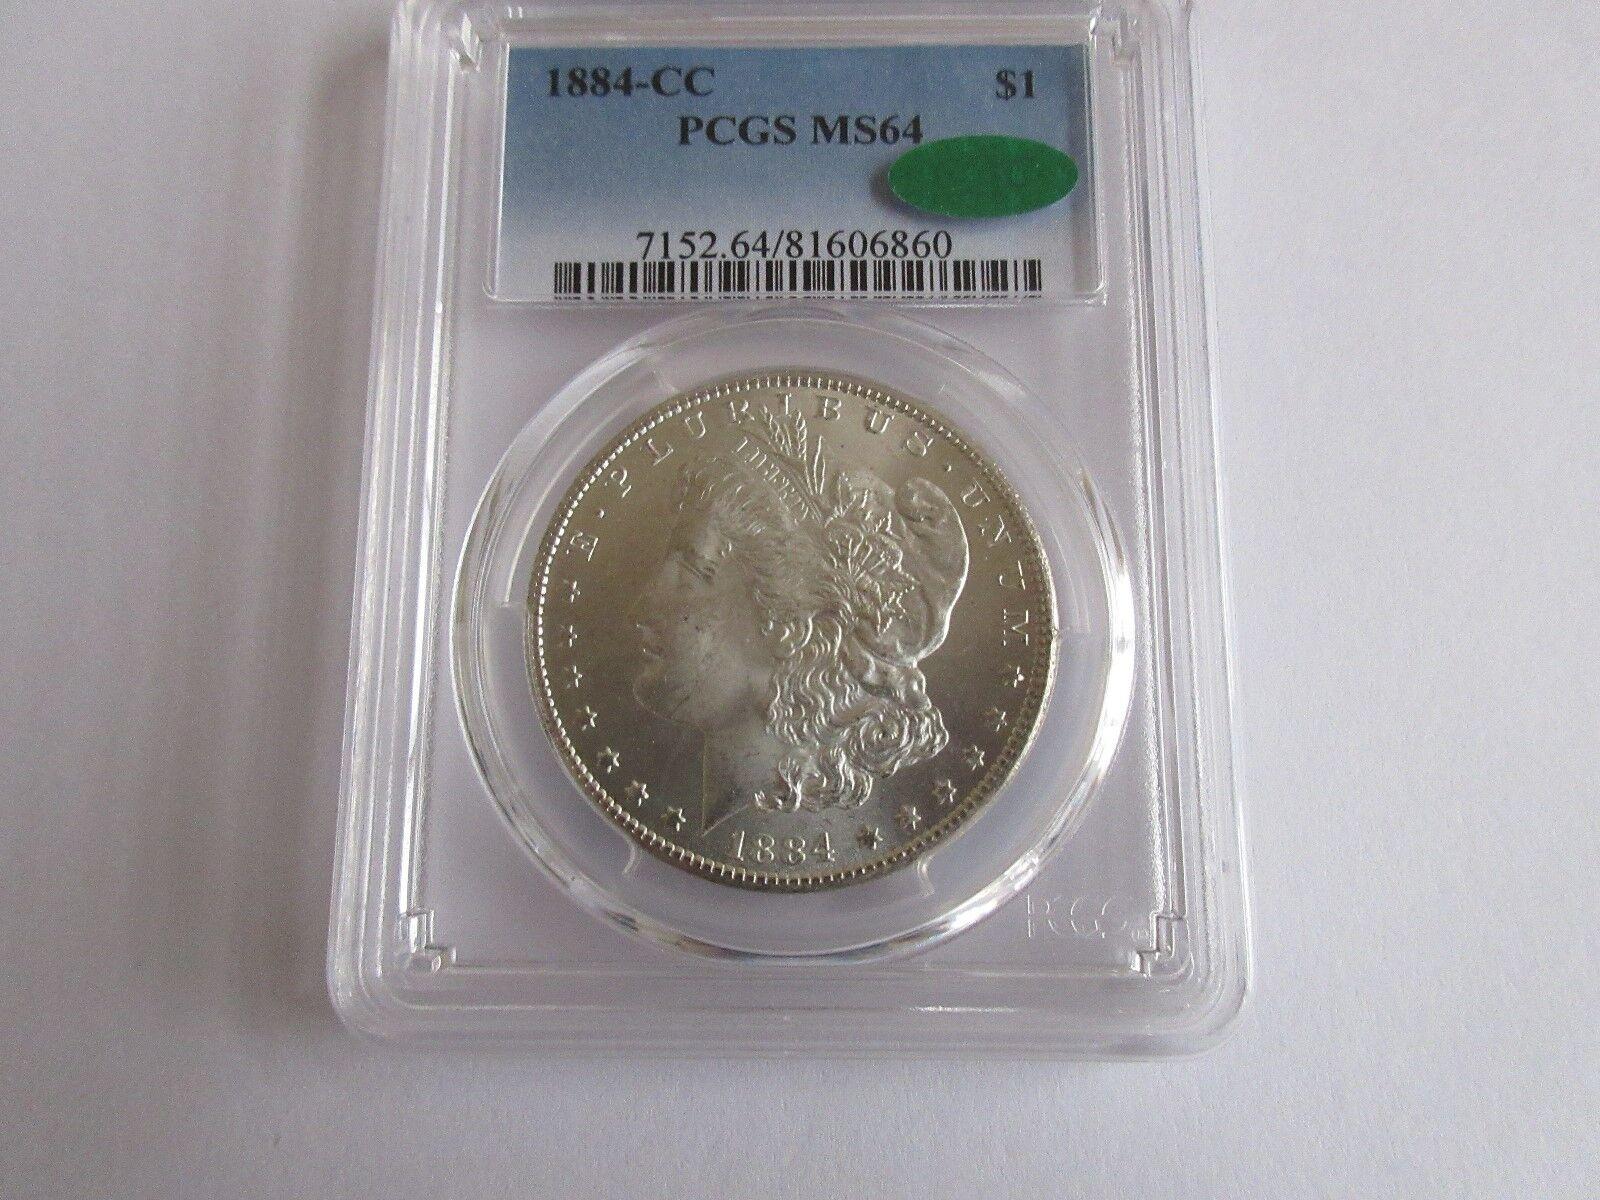 1884-CC Morgan $1 PCGS MS 64 CAC